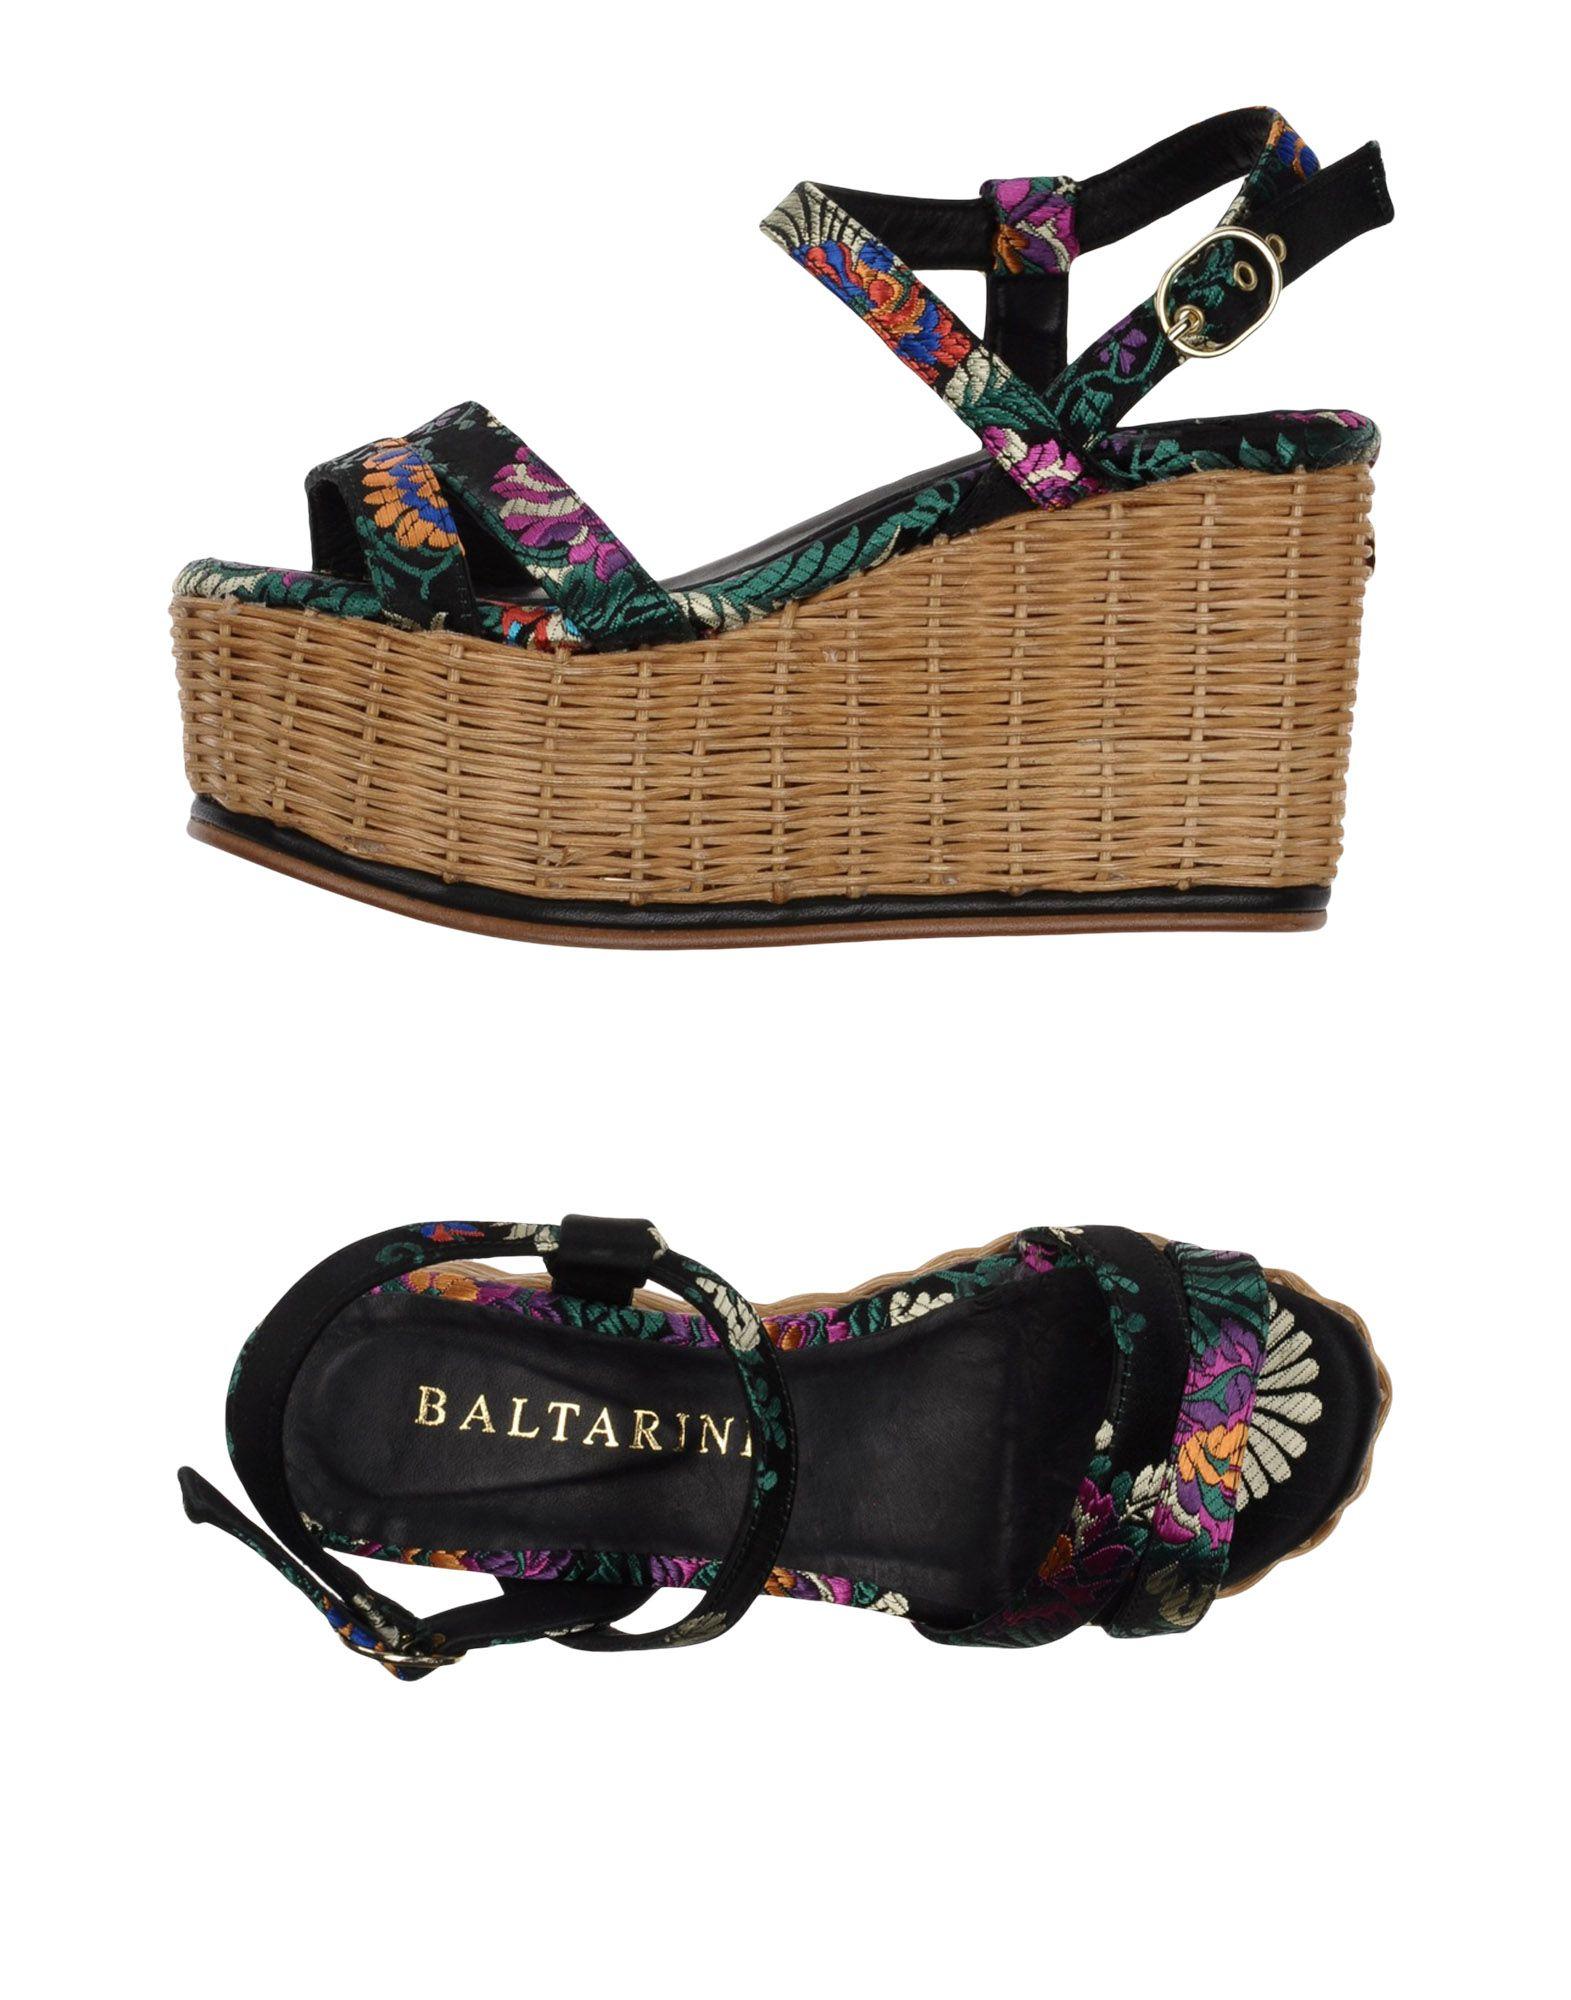 Sandales Baltarini Femme - Sandales Baltarini sur